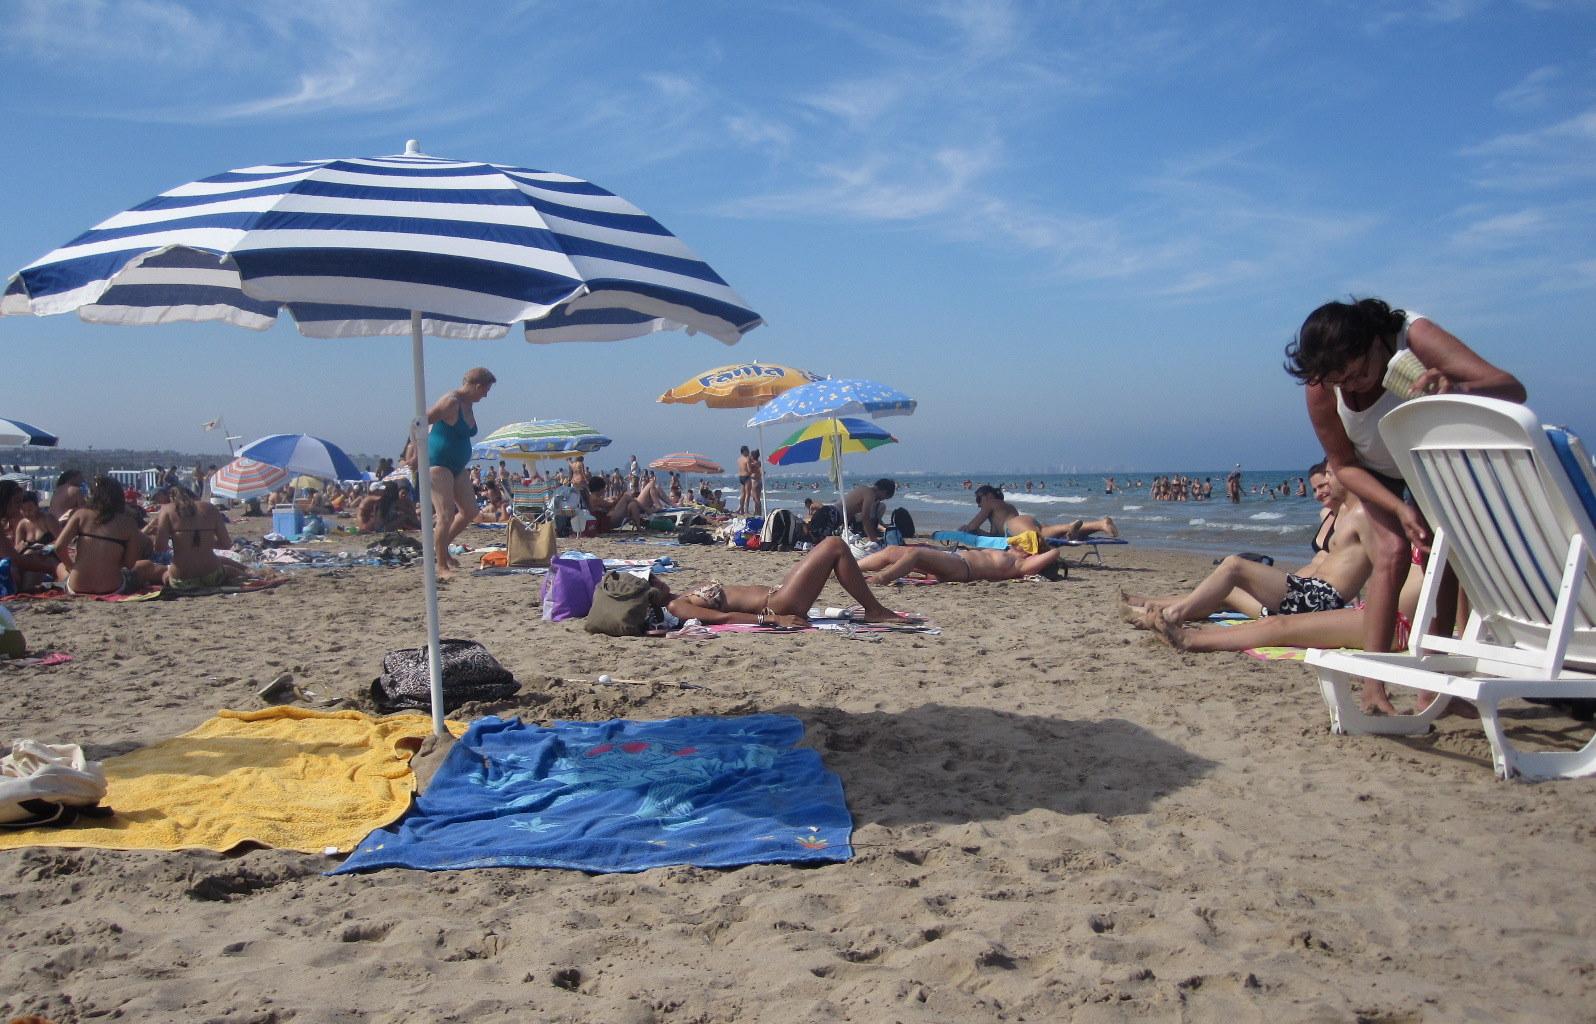 Palencia Spain  City pictures : Valencia Spain Beaches